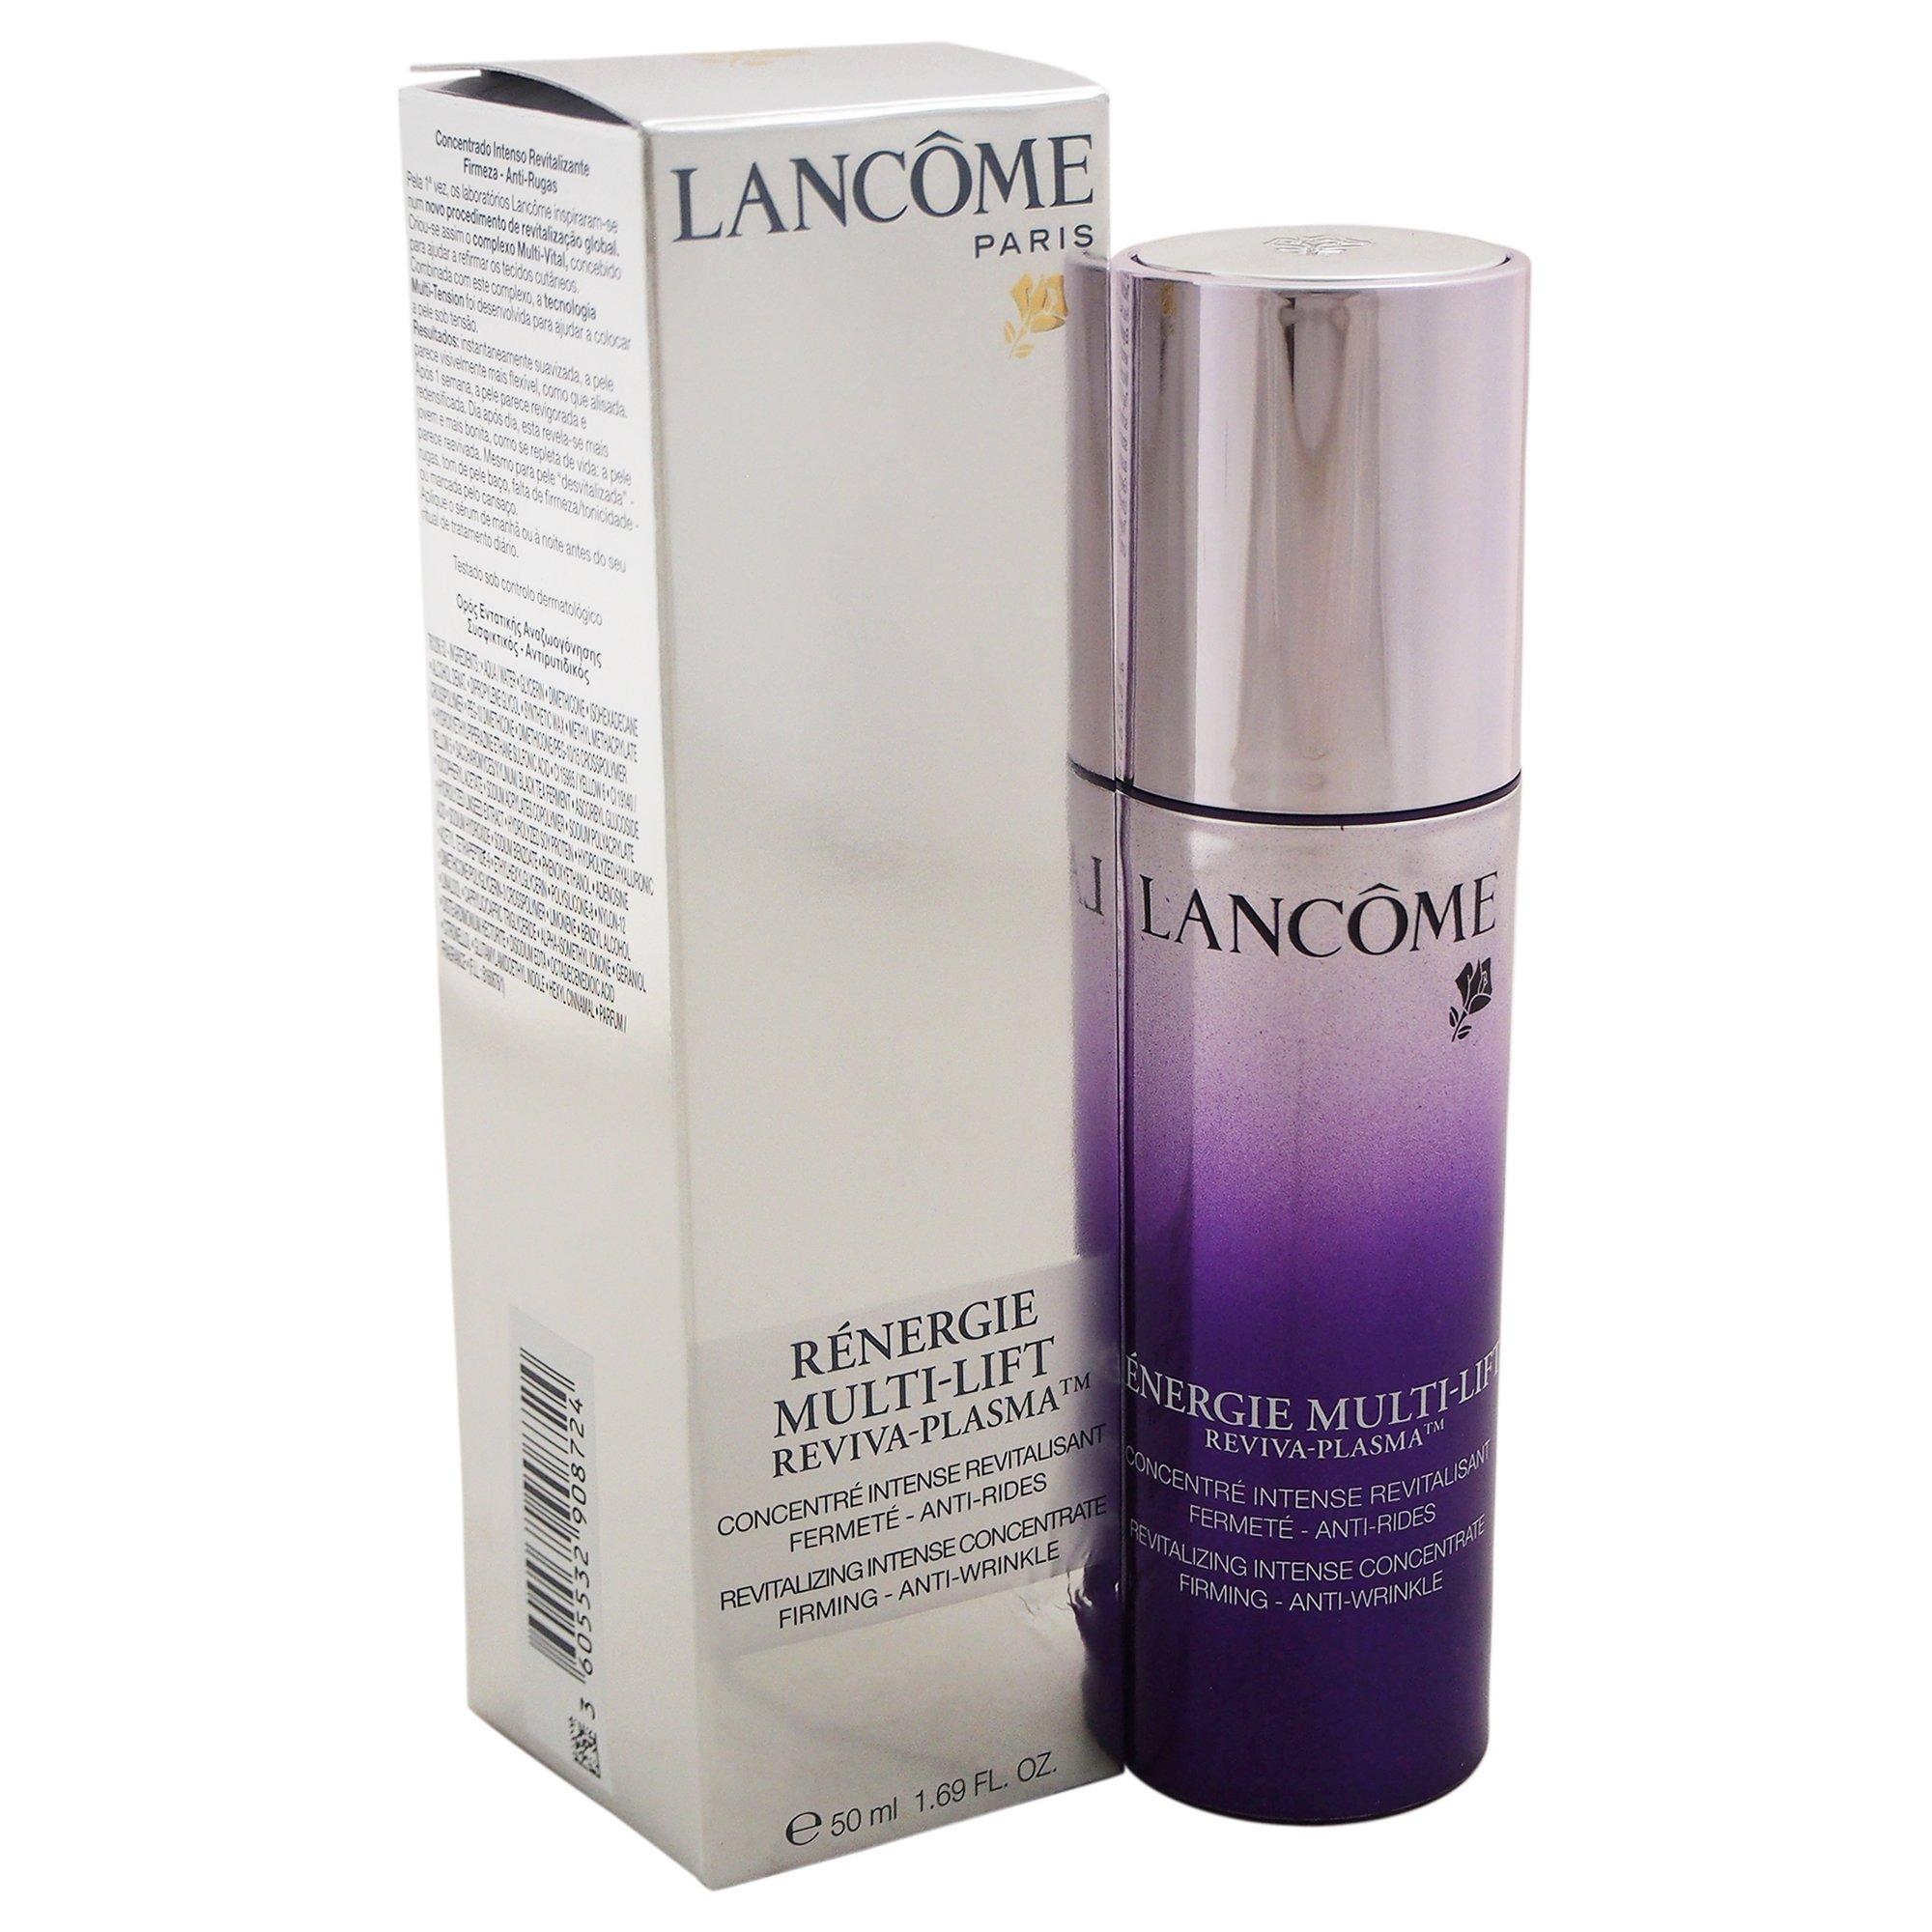 Lancome – Tratamiento Lifting Rénergie Multi-lift Reviva Plasma Lancöme